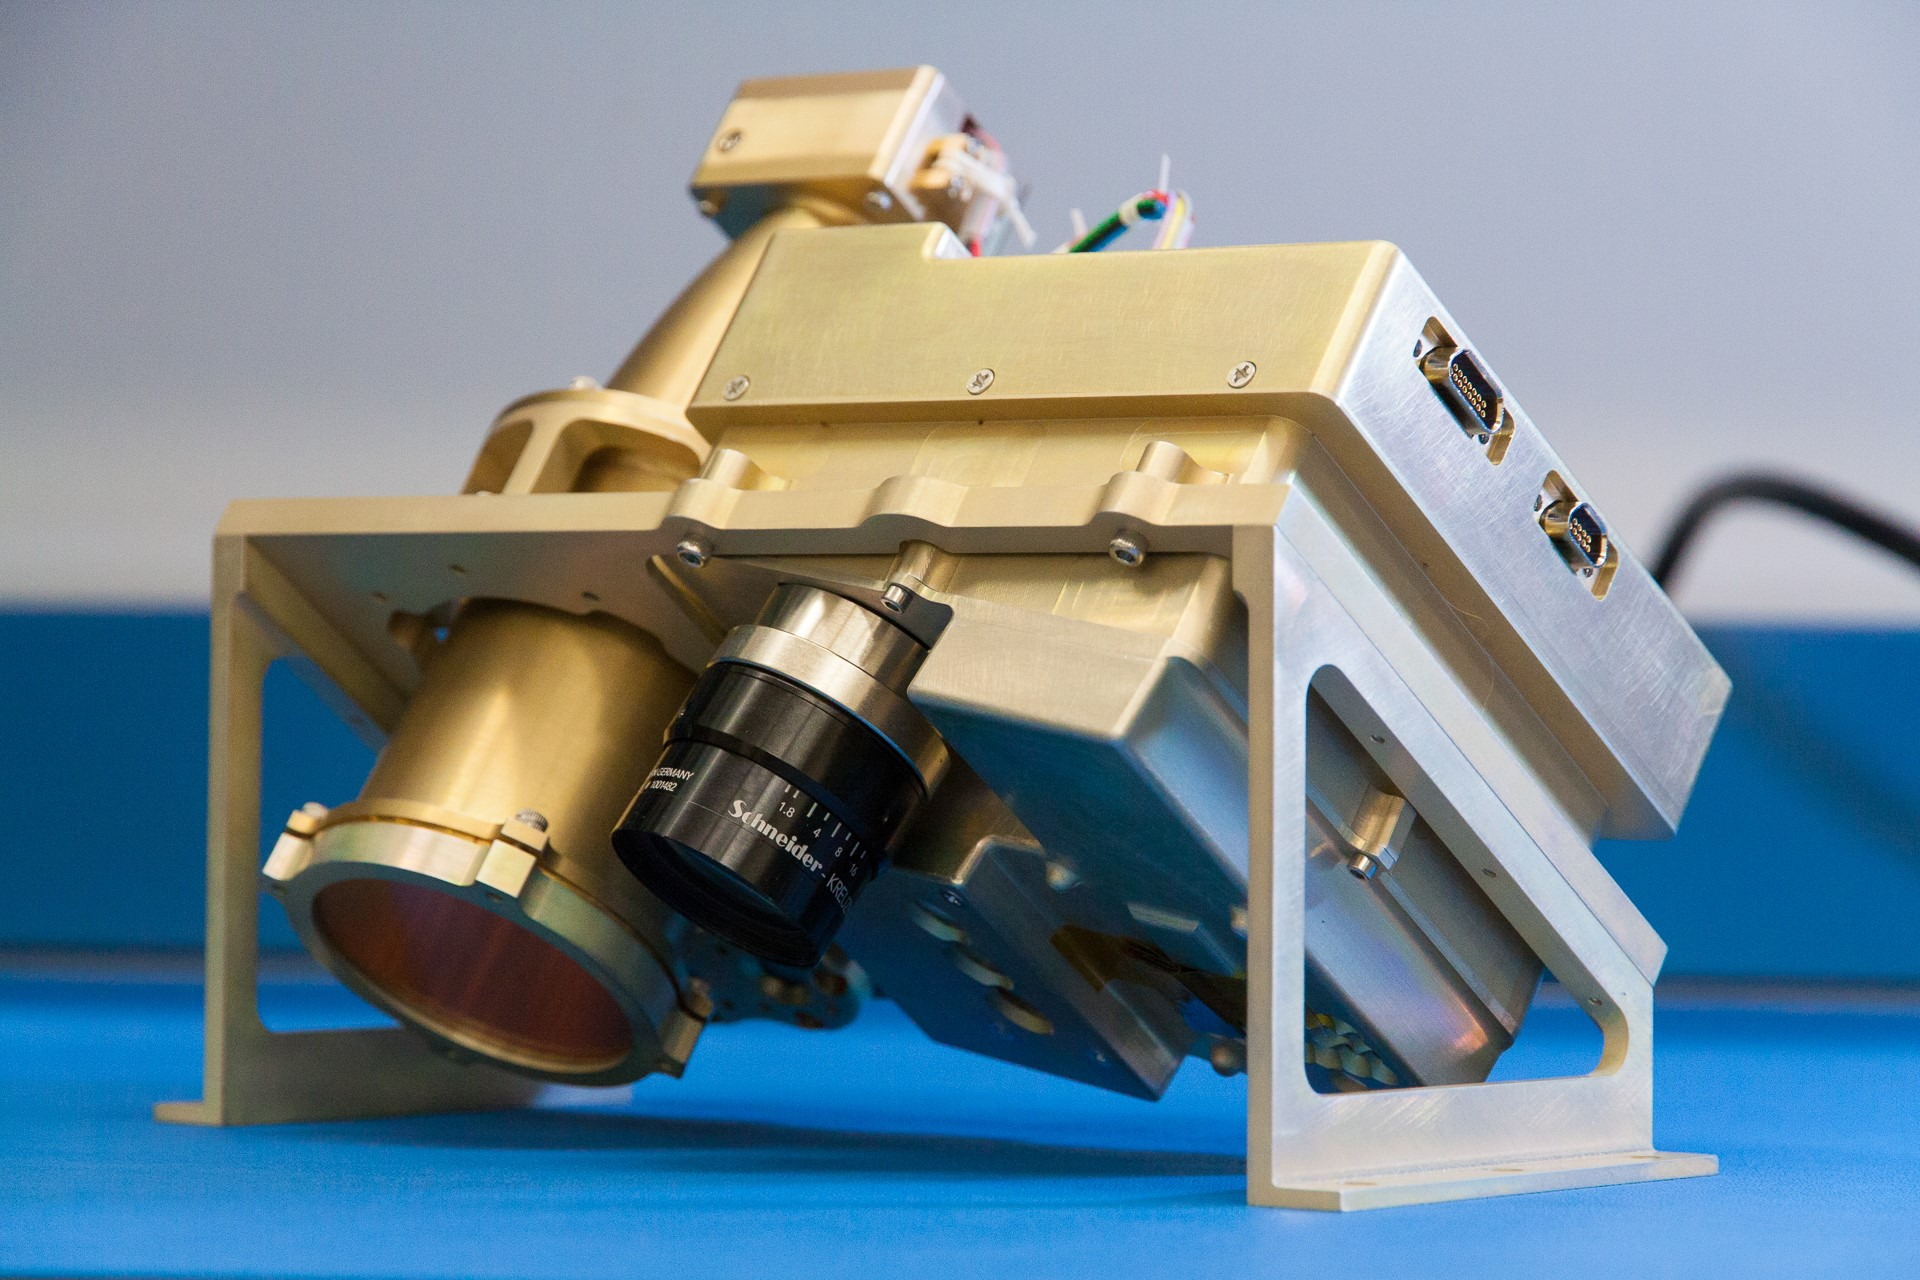 The Near Infrared Volatile Spectrometer Subsystem  Nirvss